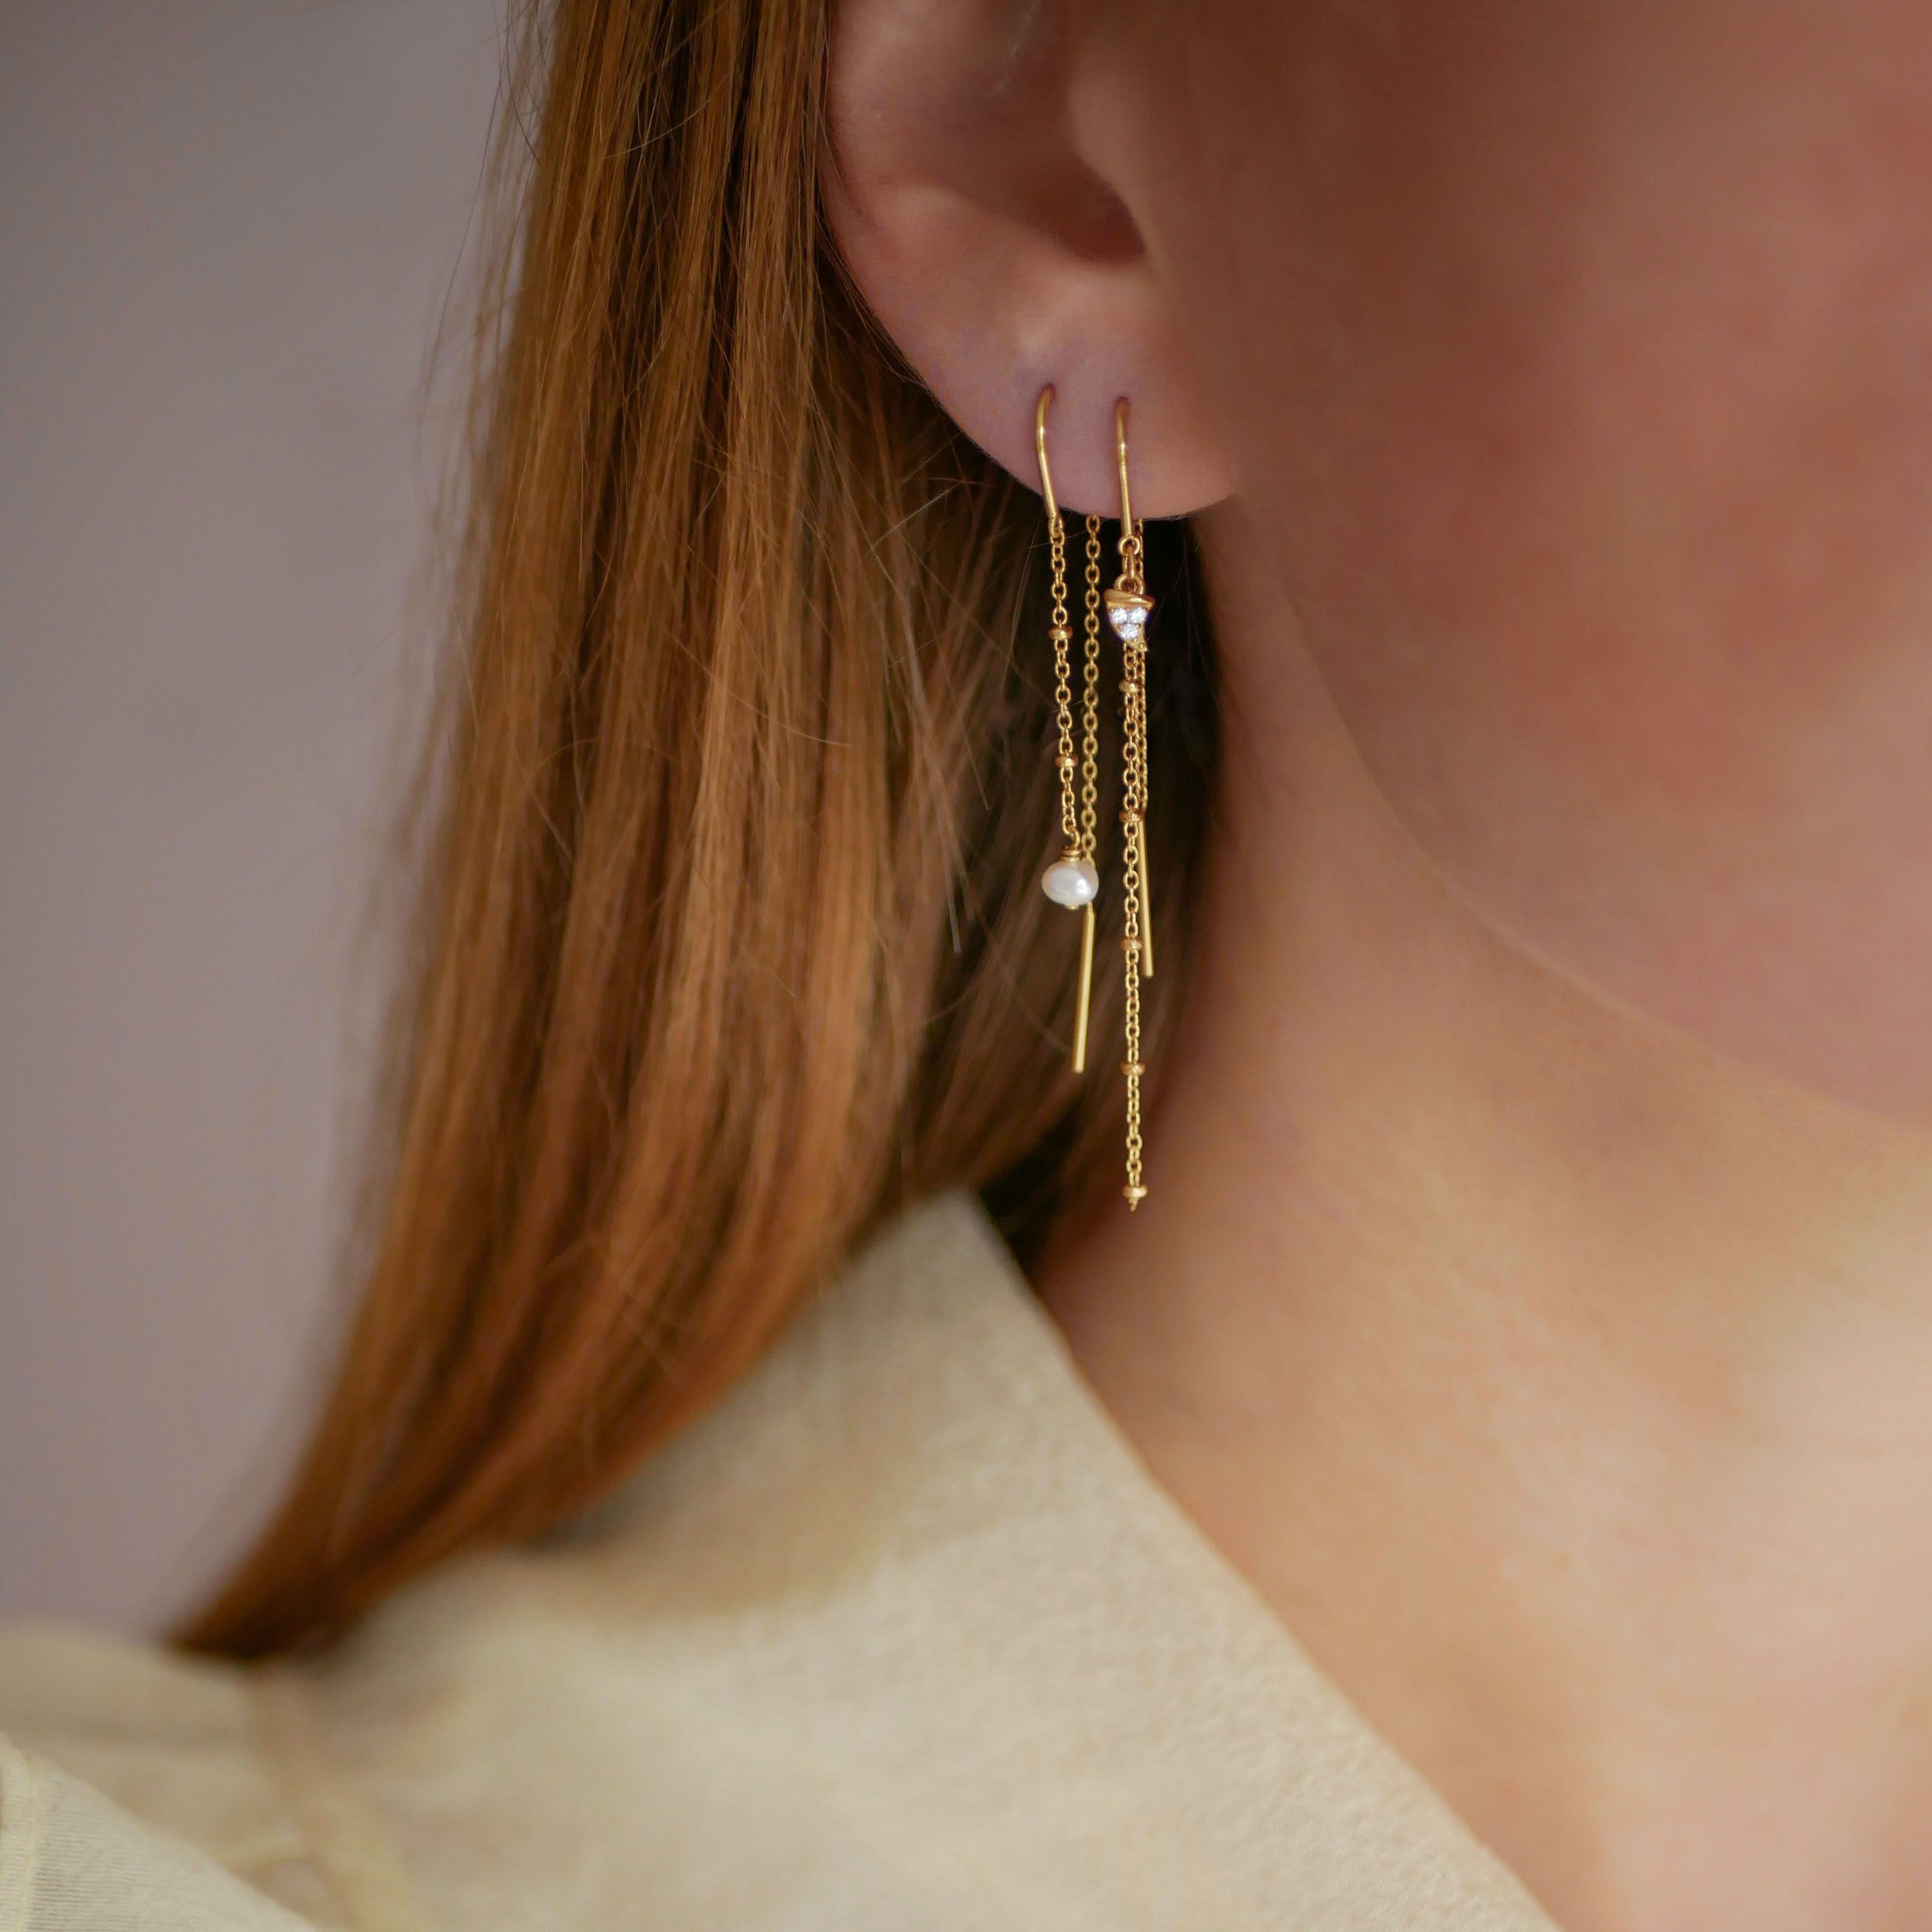 Pina Earrings Solid von Enamel Copenhagen in Vergoldet-Silber Sterling 925